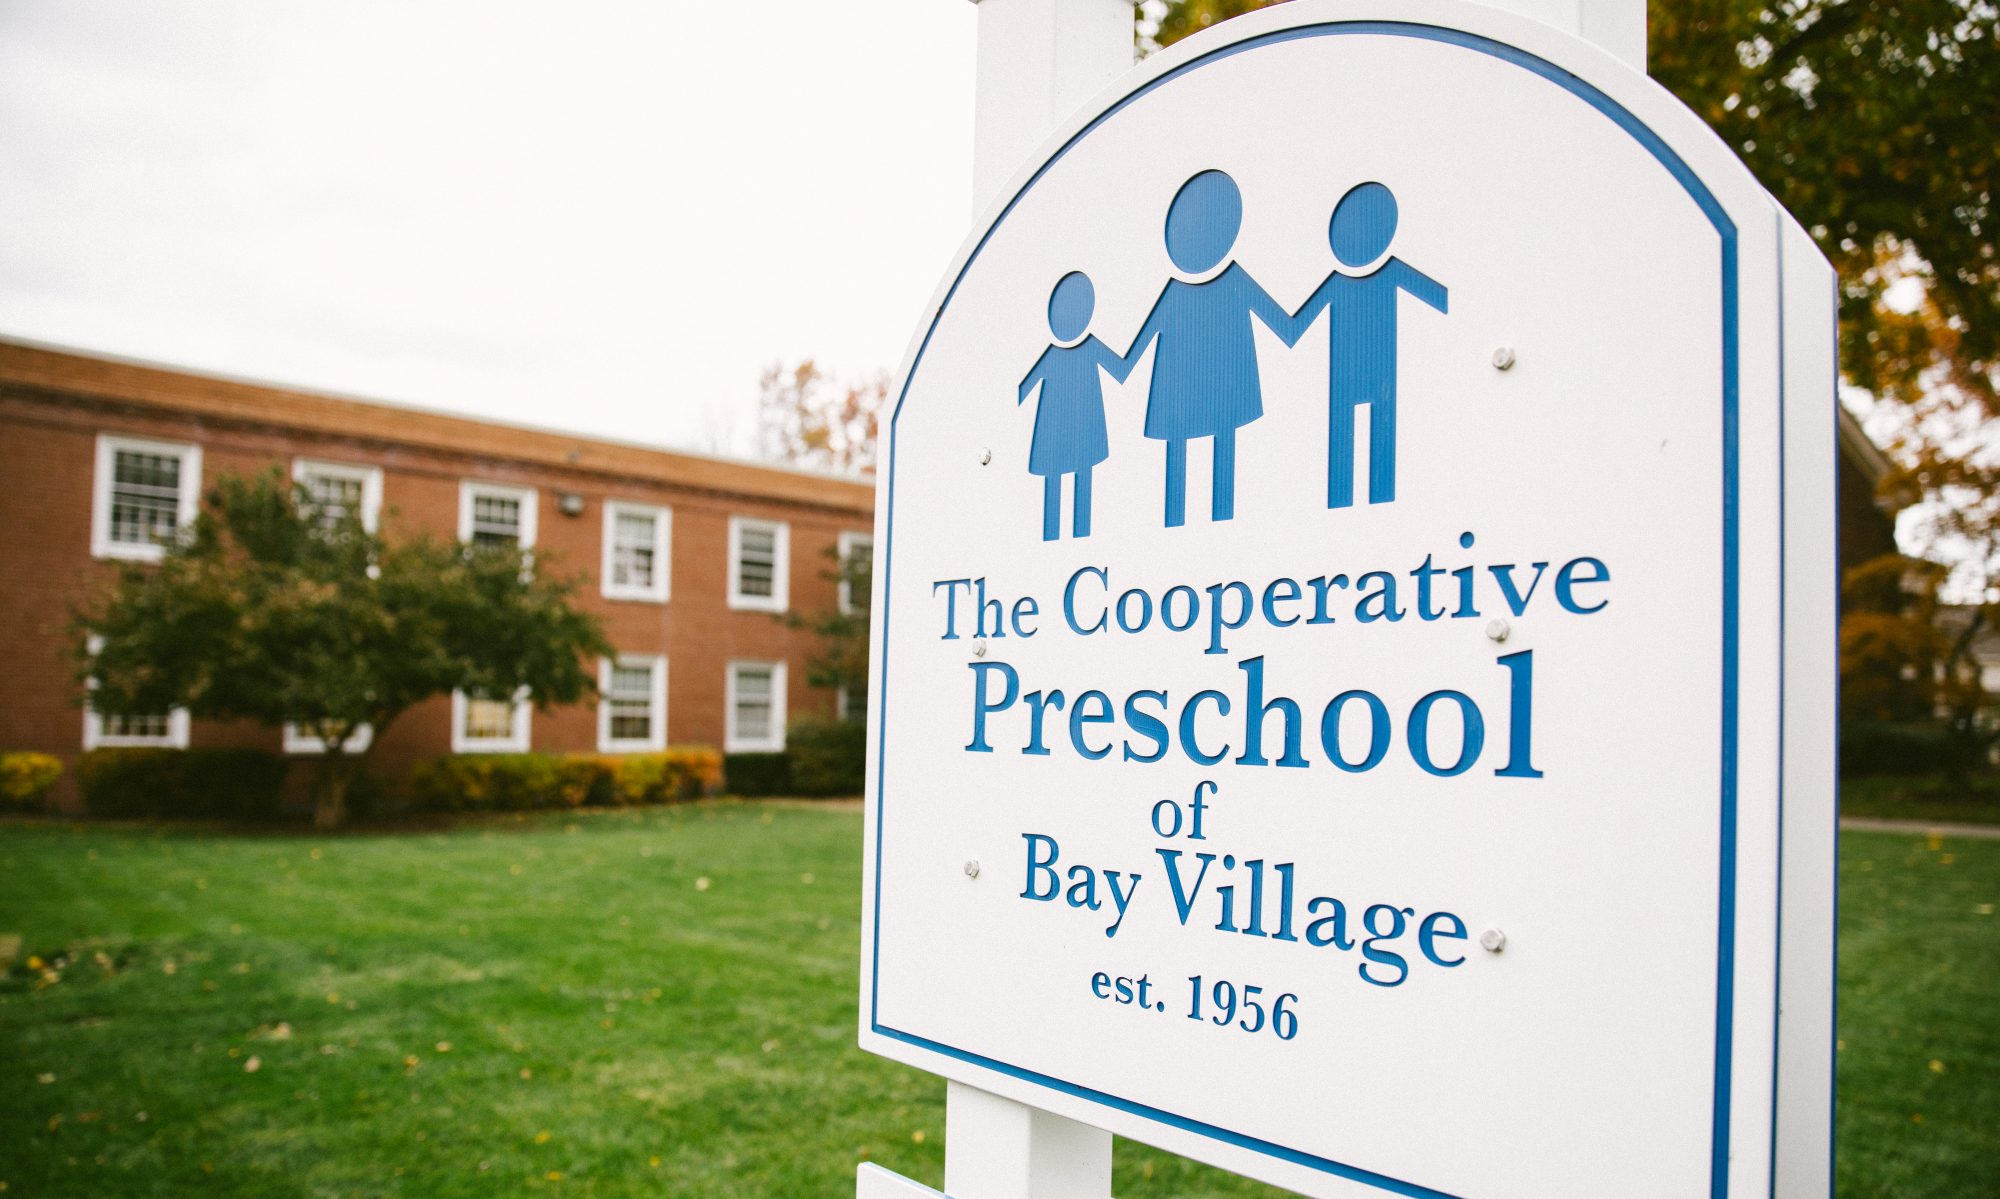 The Cooperative Preschool of Bay Village